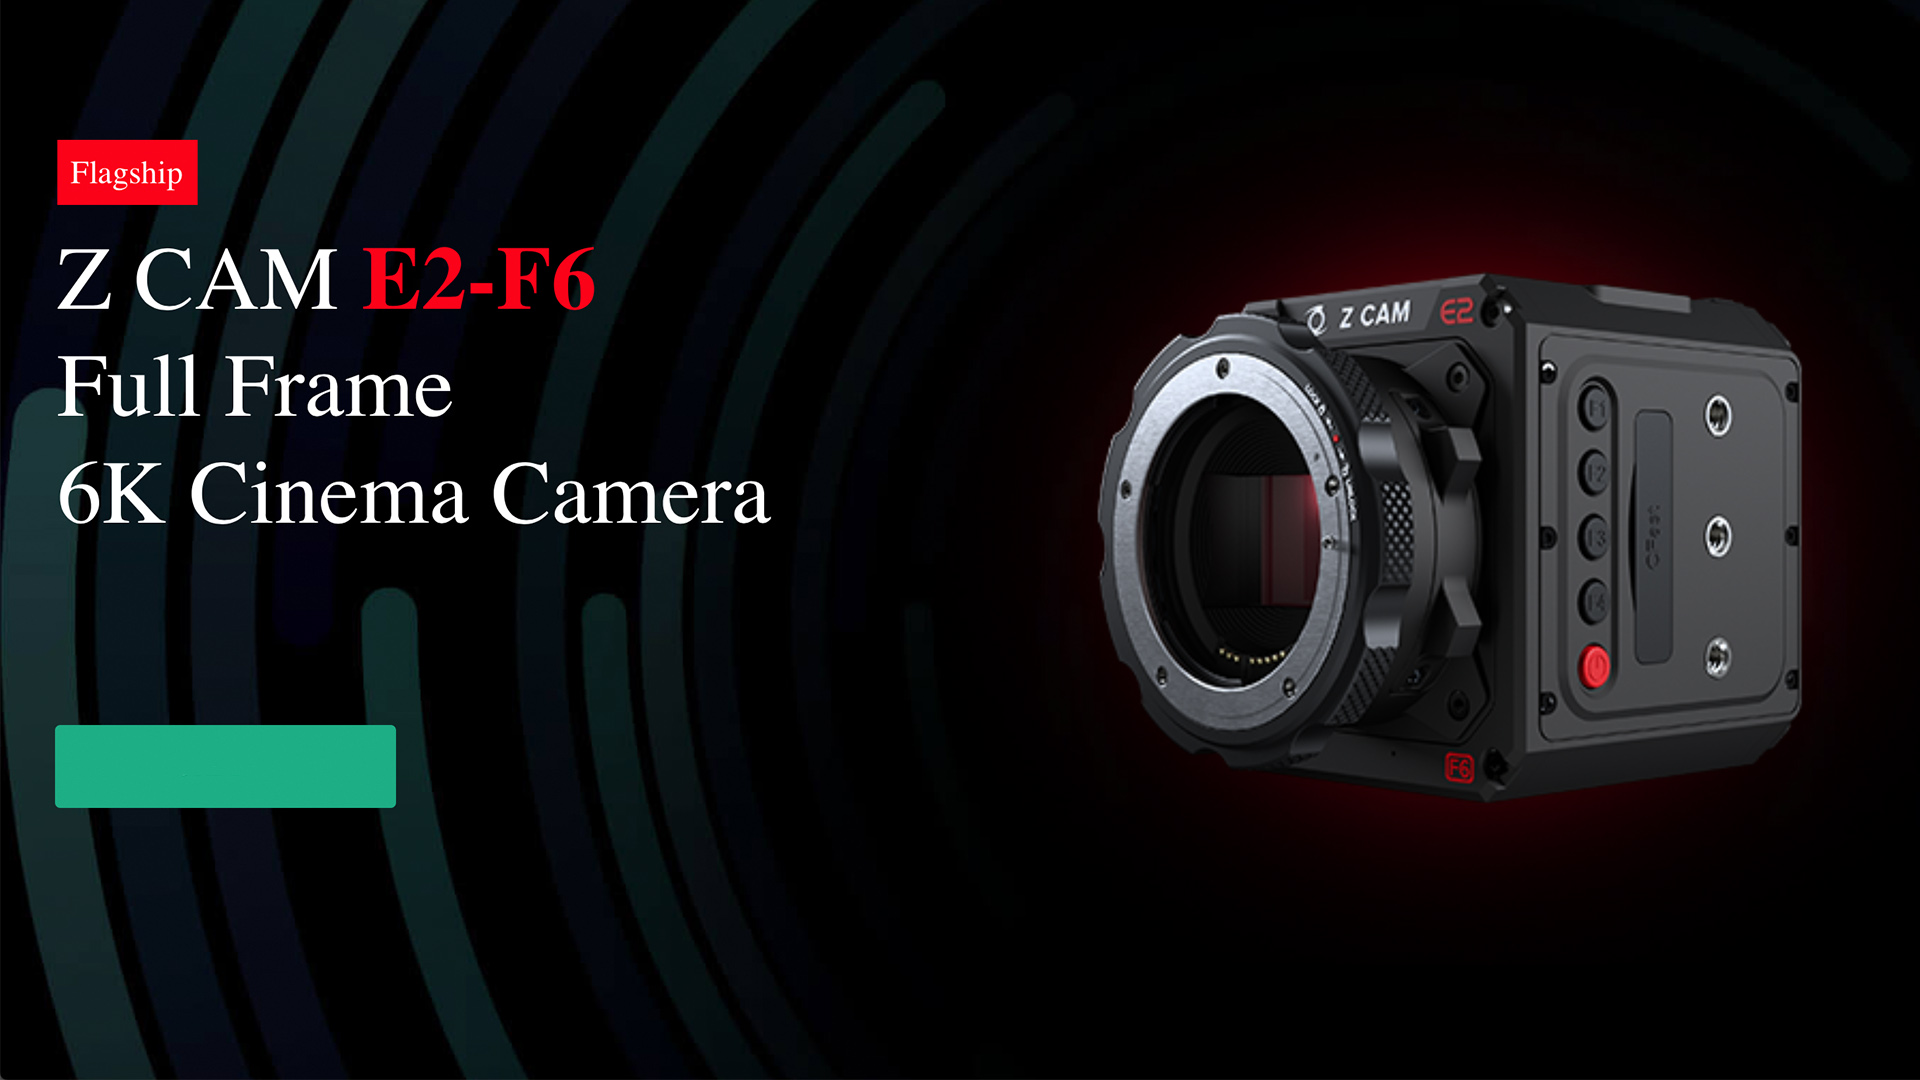 Z CAM E2-F6, S6 y F8 – cámaras asequibles de alta resolución listas para pre-pedidos